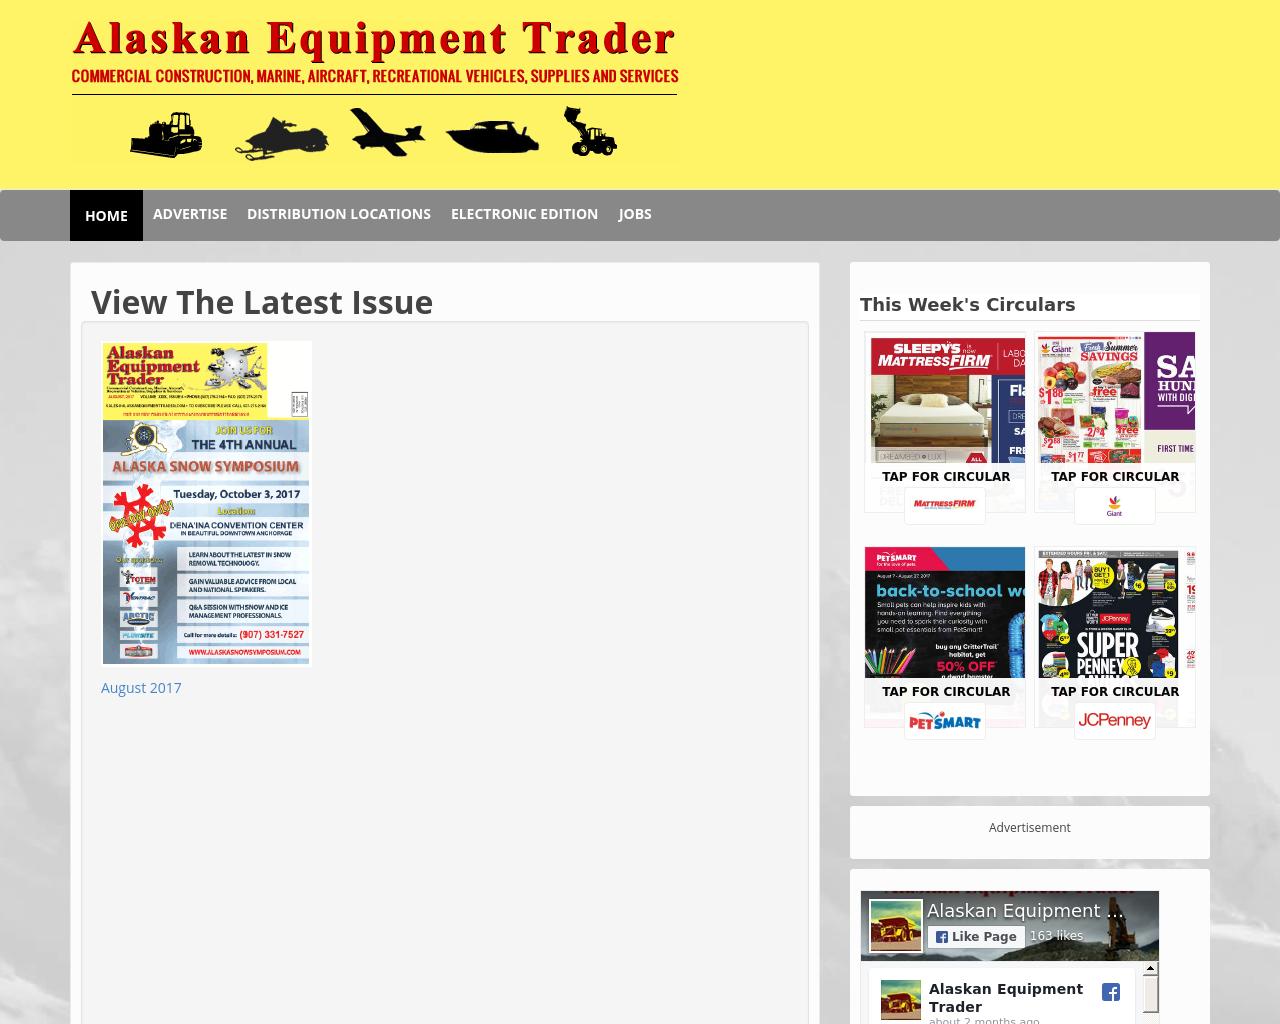 Alaskan-Equipment-Trader-Advertising-Reviews-Pricing